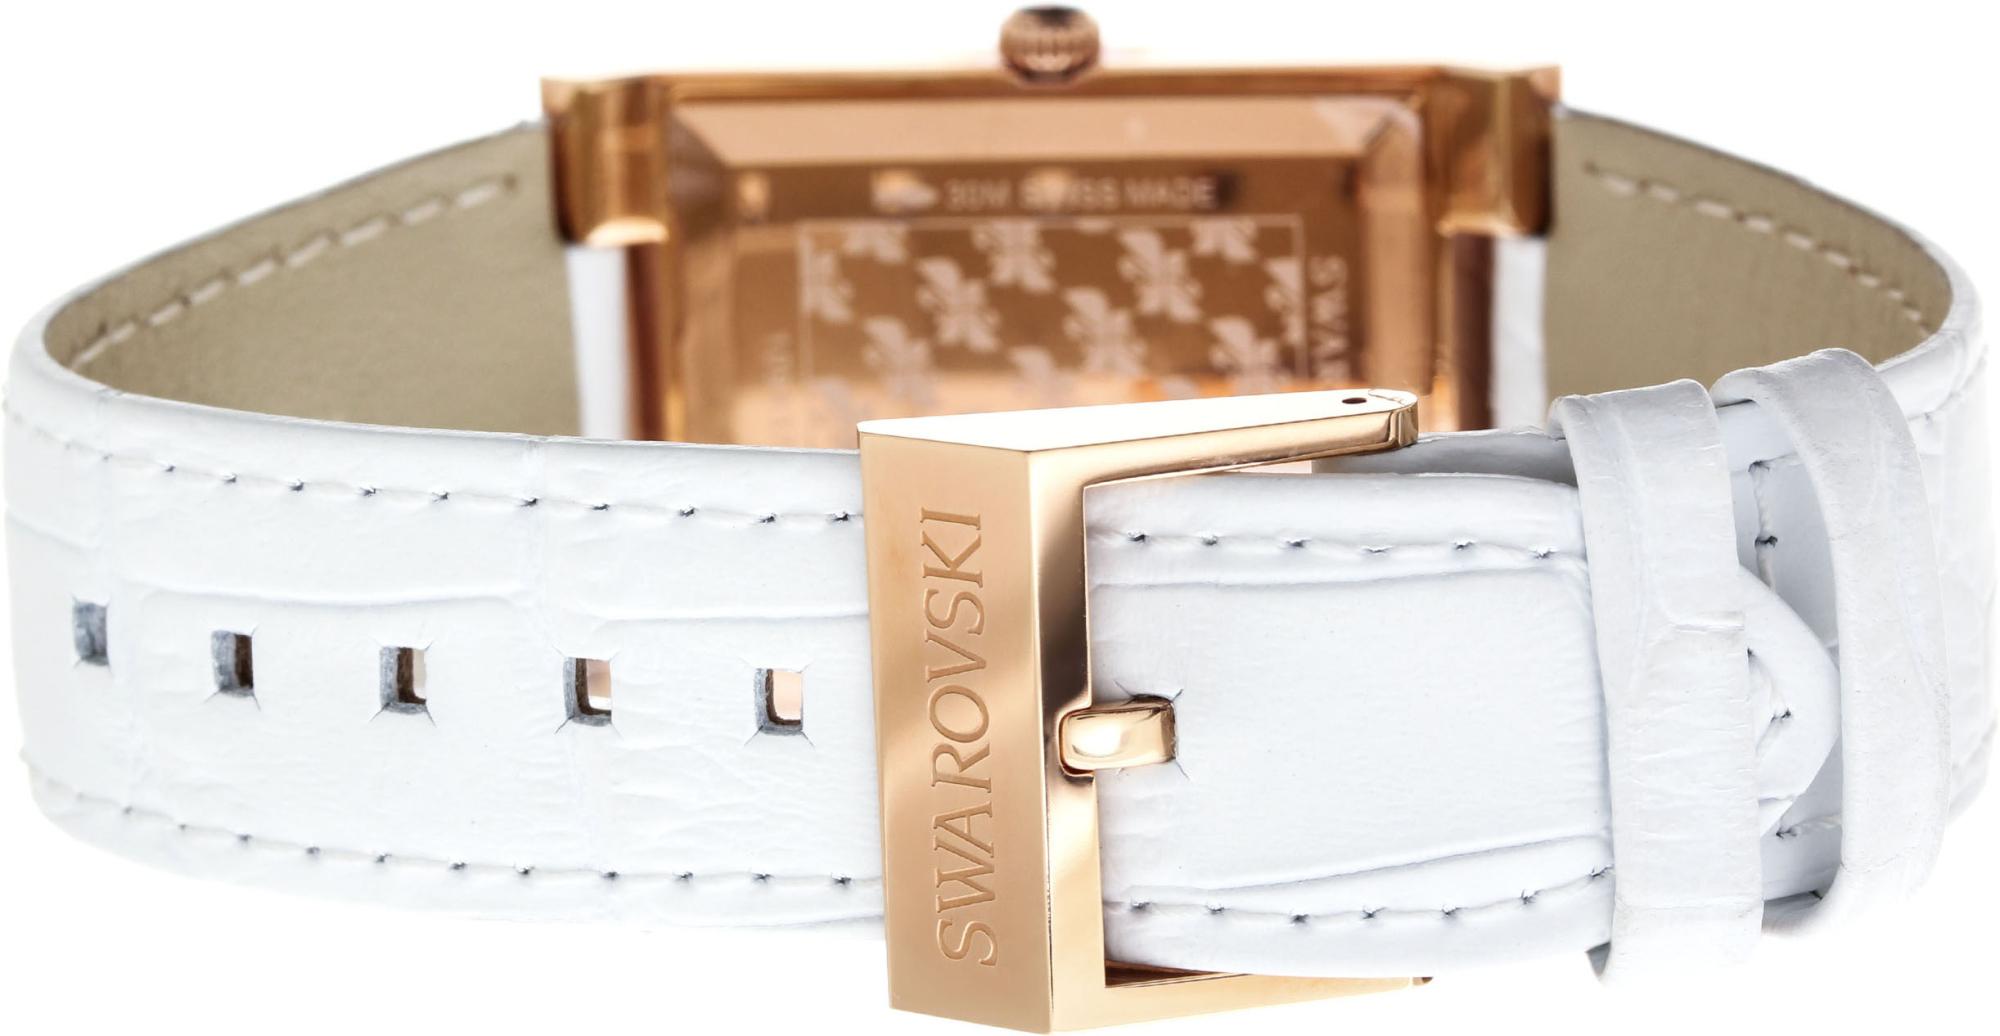 Swarovski Citra Square White Rose Gold Tone 1094370Наручные часы<br>Швейцарские часы Swarovski Citra Square White Rose Gold Tone 1094370<br><br>Пол: Женские<br>Страна-производитель: Швейцария<br>Механизм: Кварцевый<br>Материал корпуса: Сталь<br>Материал ремня/браслета: Кожа<br>Водозащита, диапазон: 20 - 100 м<br>Стекло: Сапфировое<br>Толщина корпуса: 7мм<br>Стиль: Мода